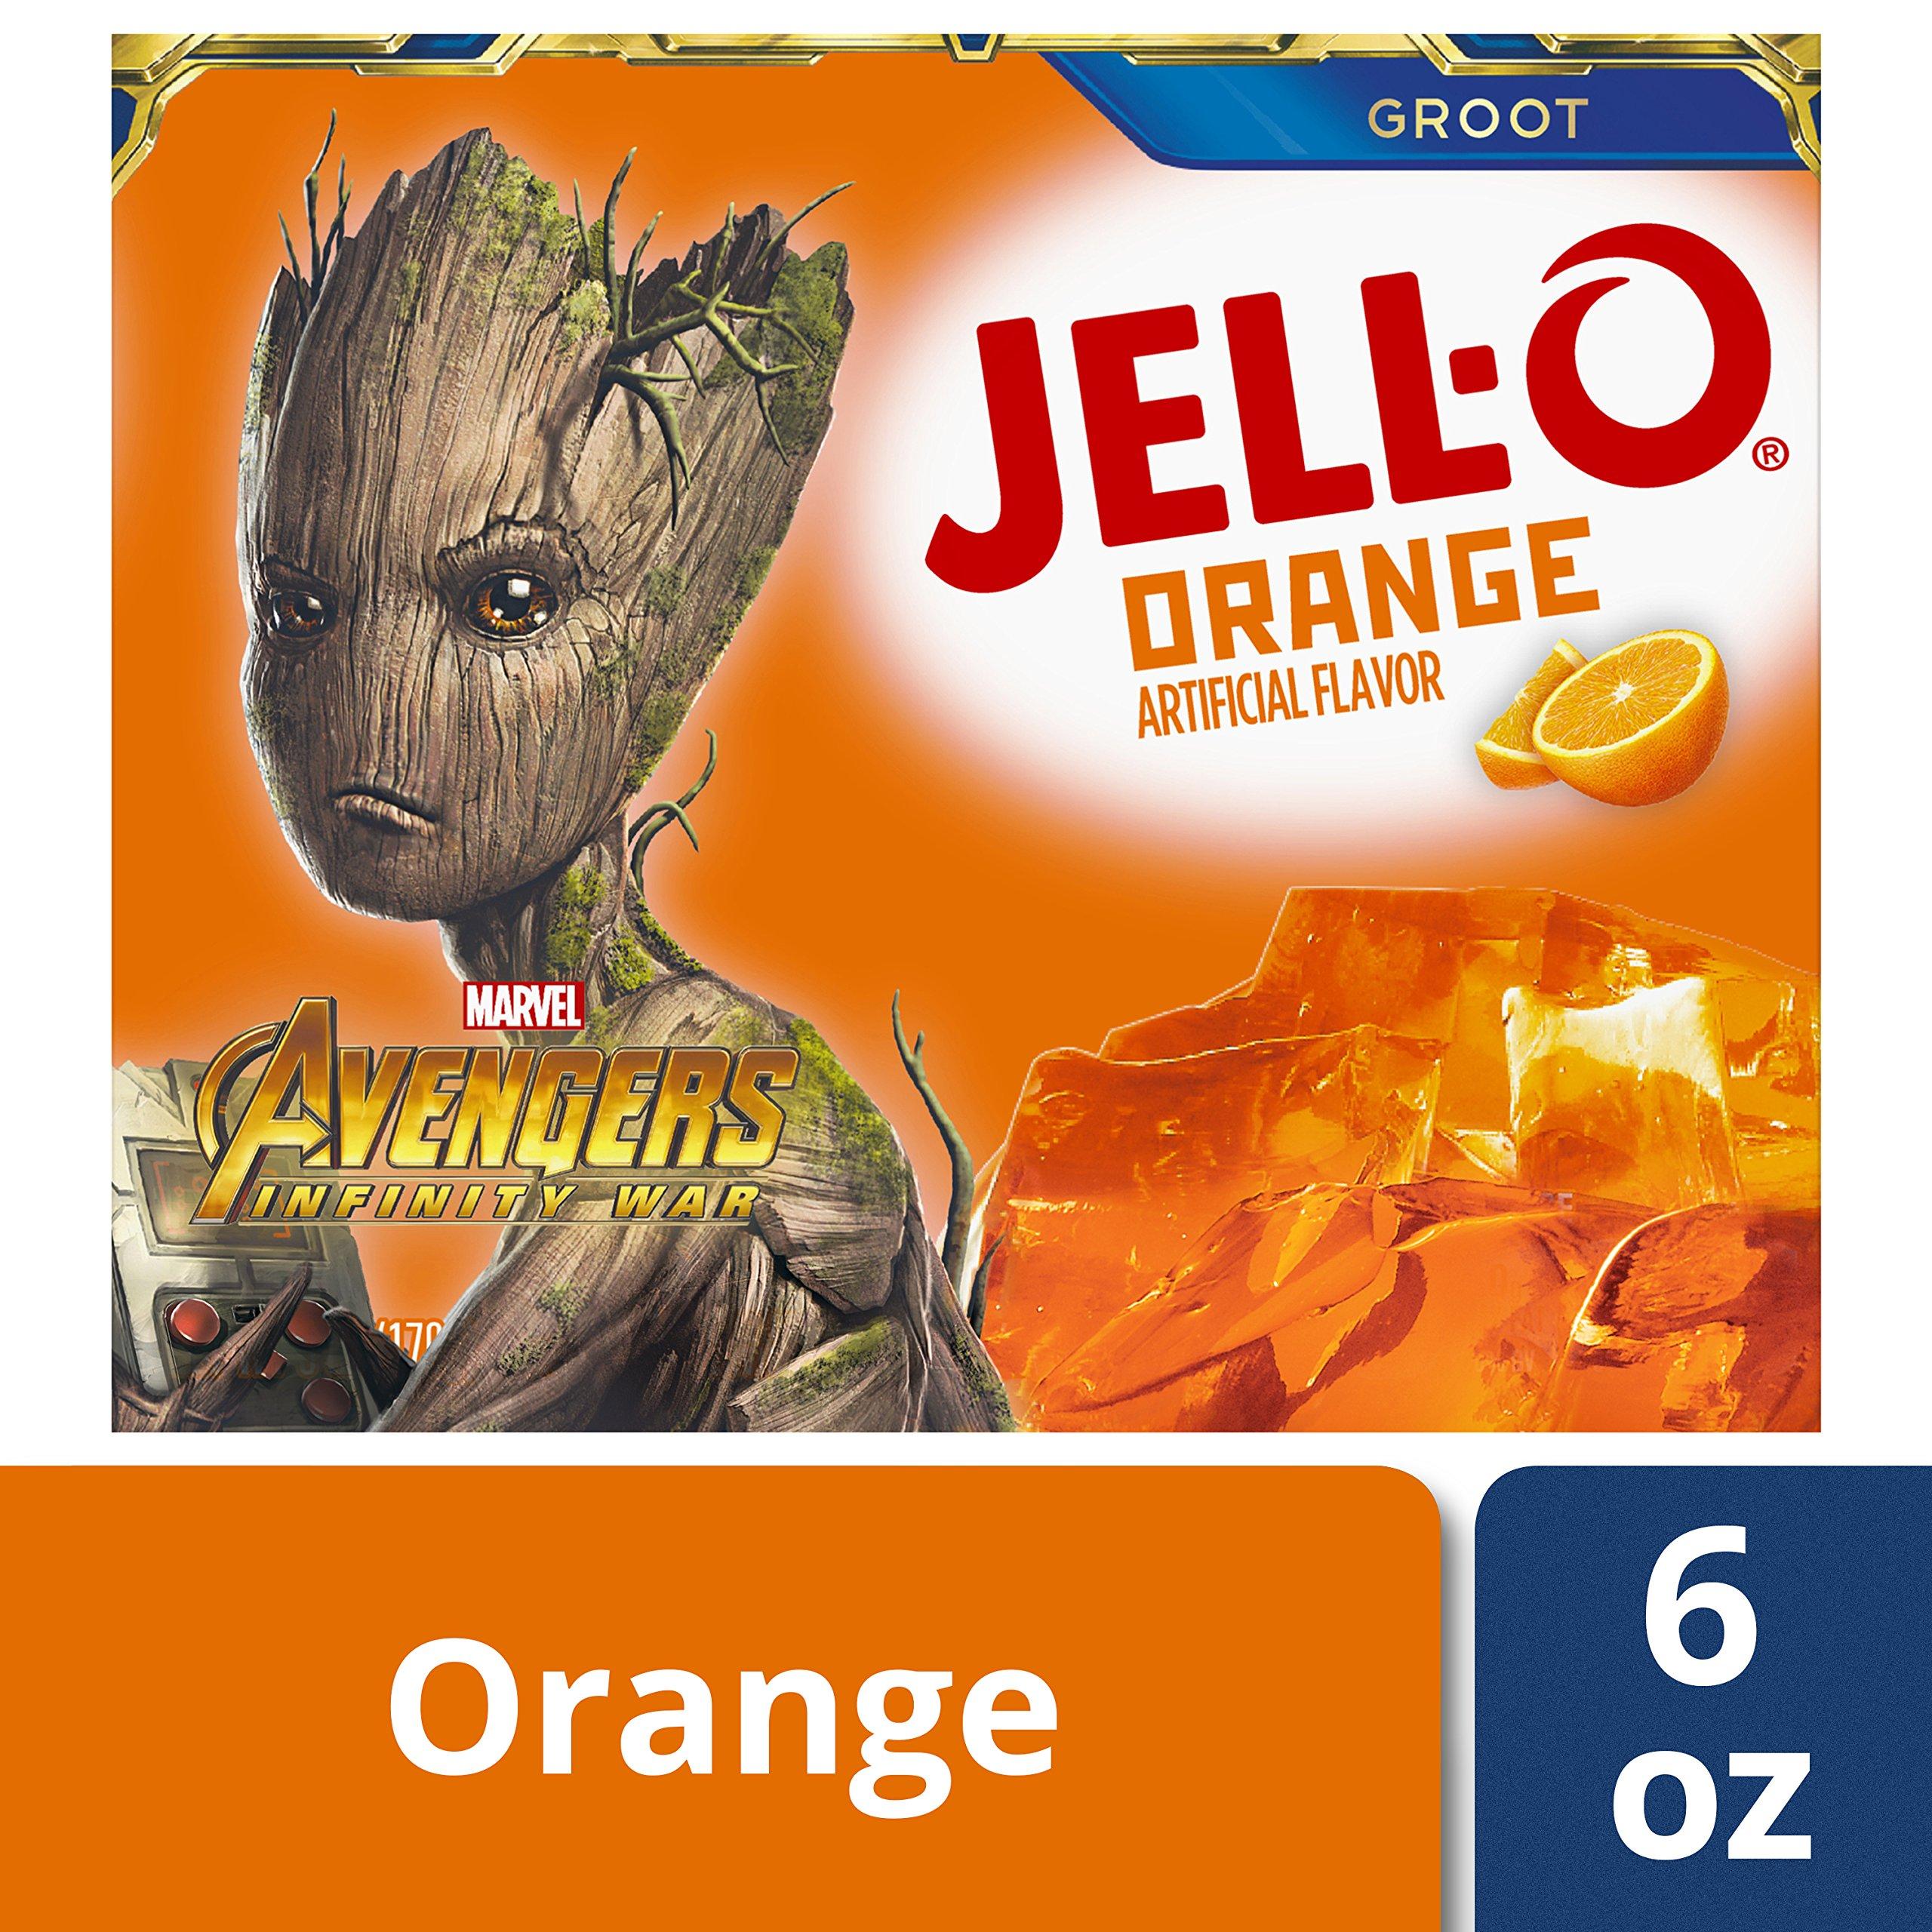 Jell-O Orange Gelatin Dessert Mix, 6 oz Box by Jell-O (Image #4)